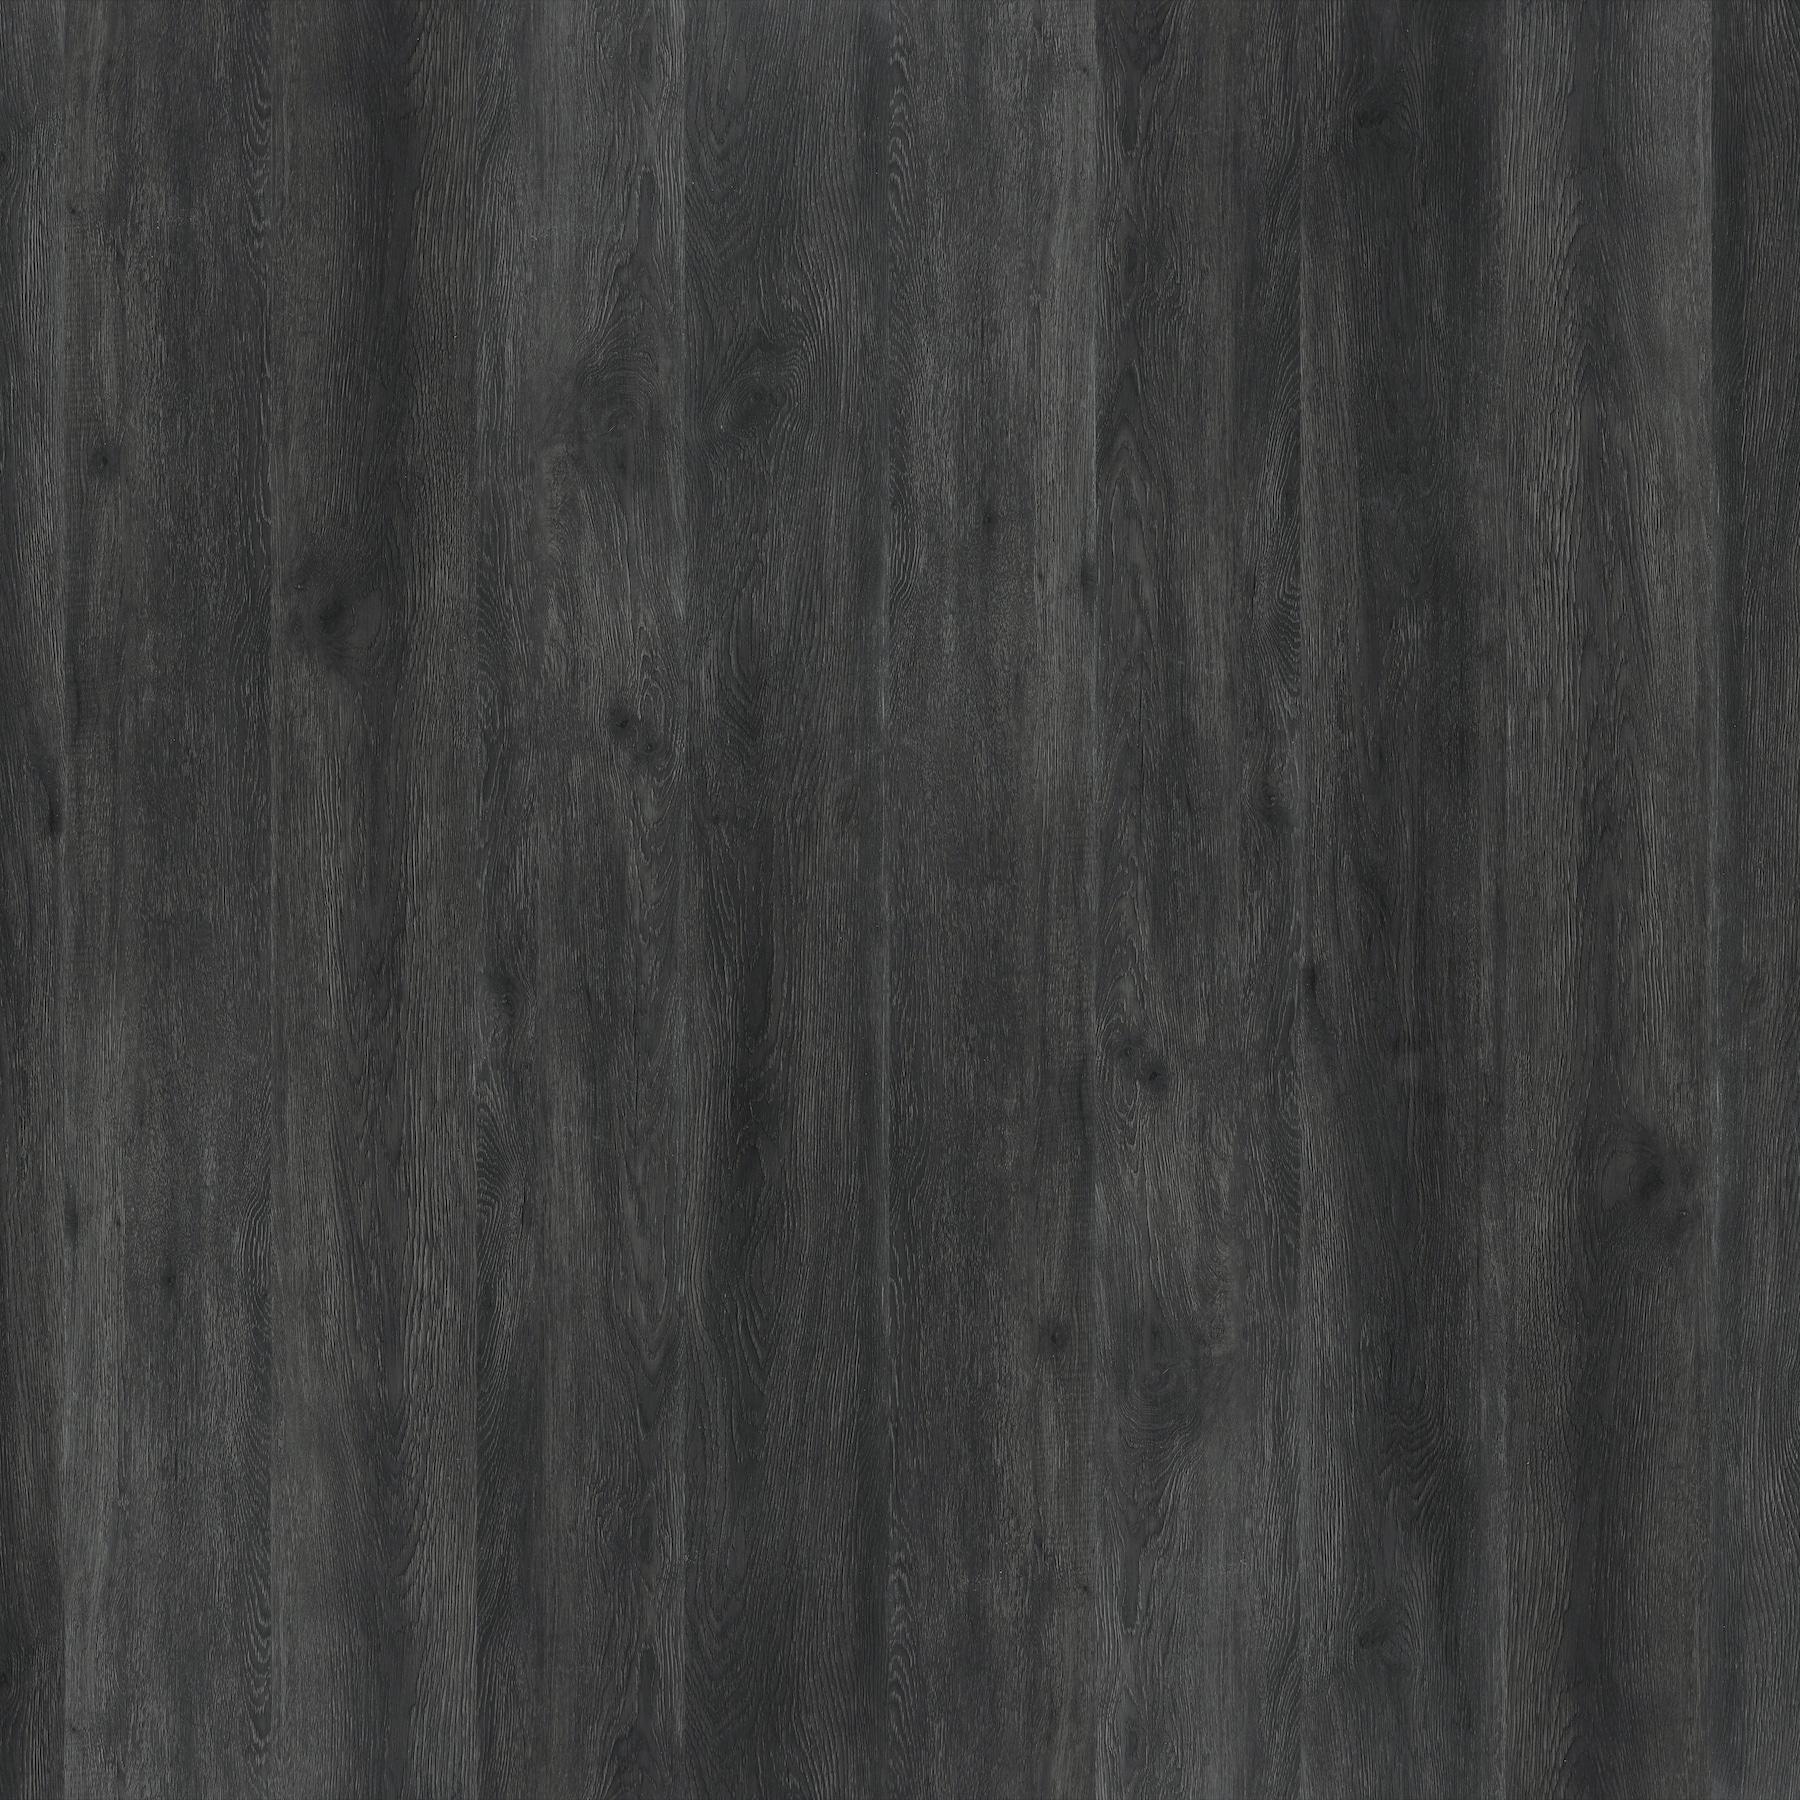 Topdeck Avala Hybrid Flooring Moschino - The Flooring Guys